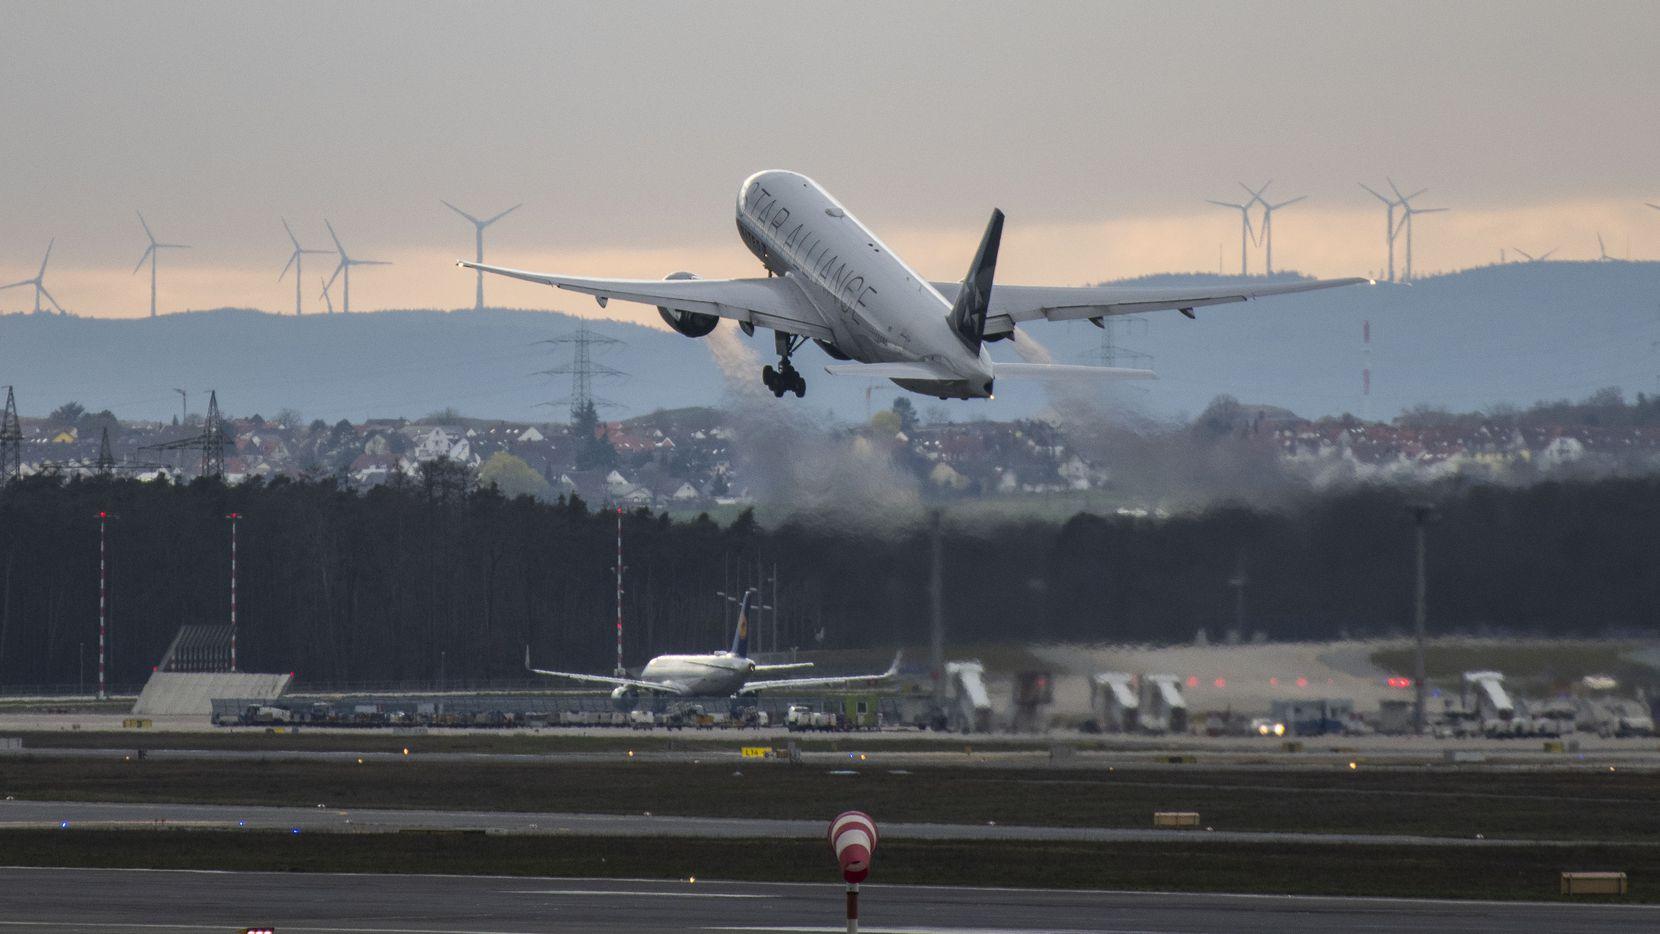 United Airlines Coronavirus Loss Already Costing It 1 5 Billion In Revenue